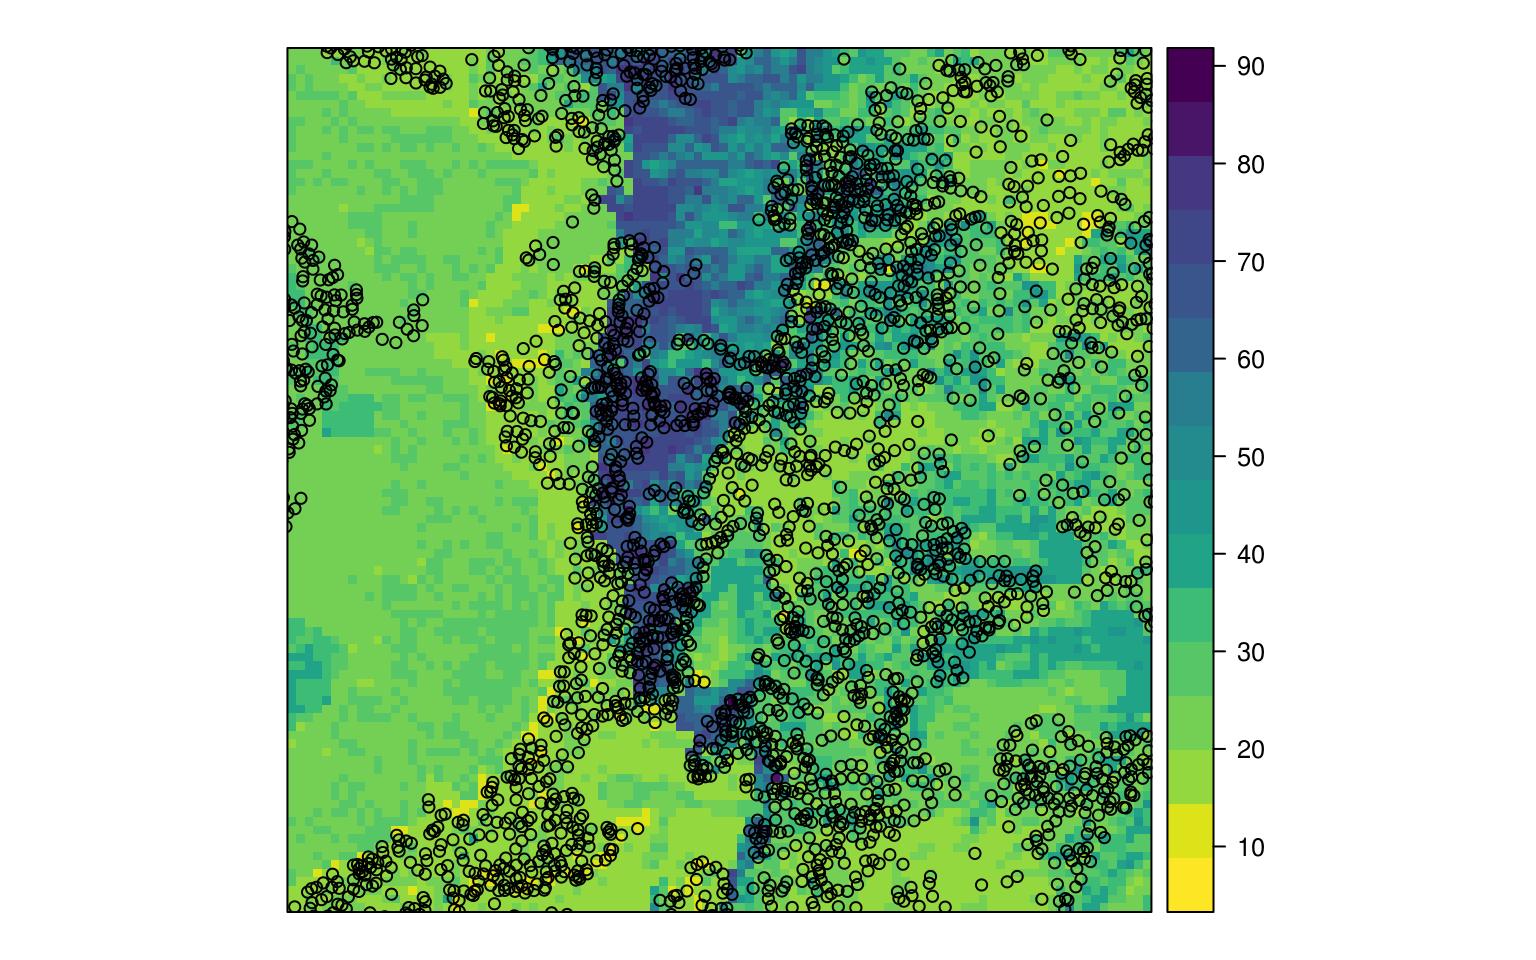 6 Machine Learning Algorithms for soil mapping | Predictive Soil ...